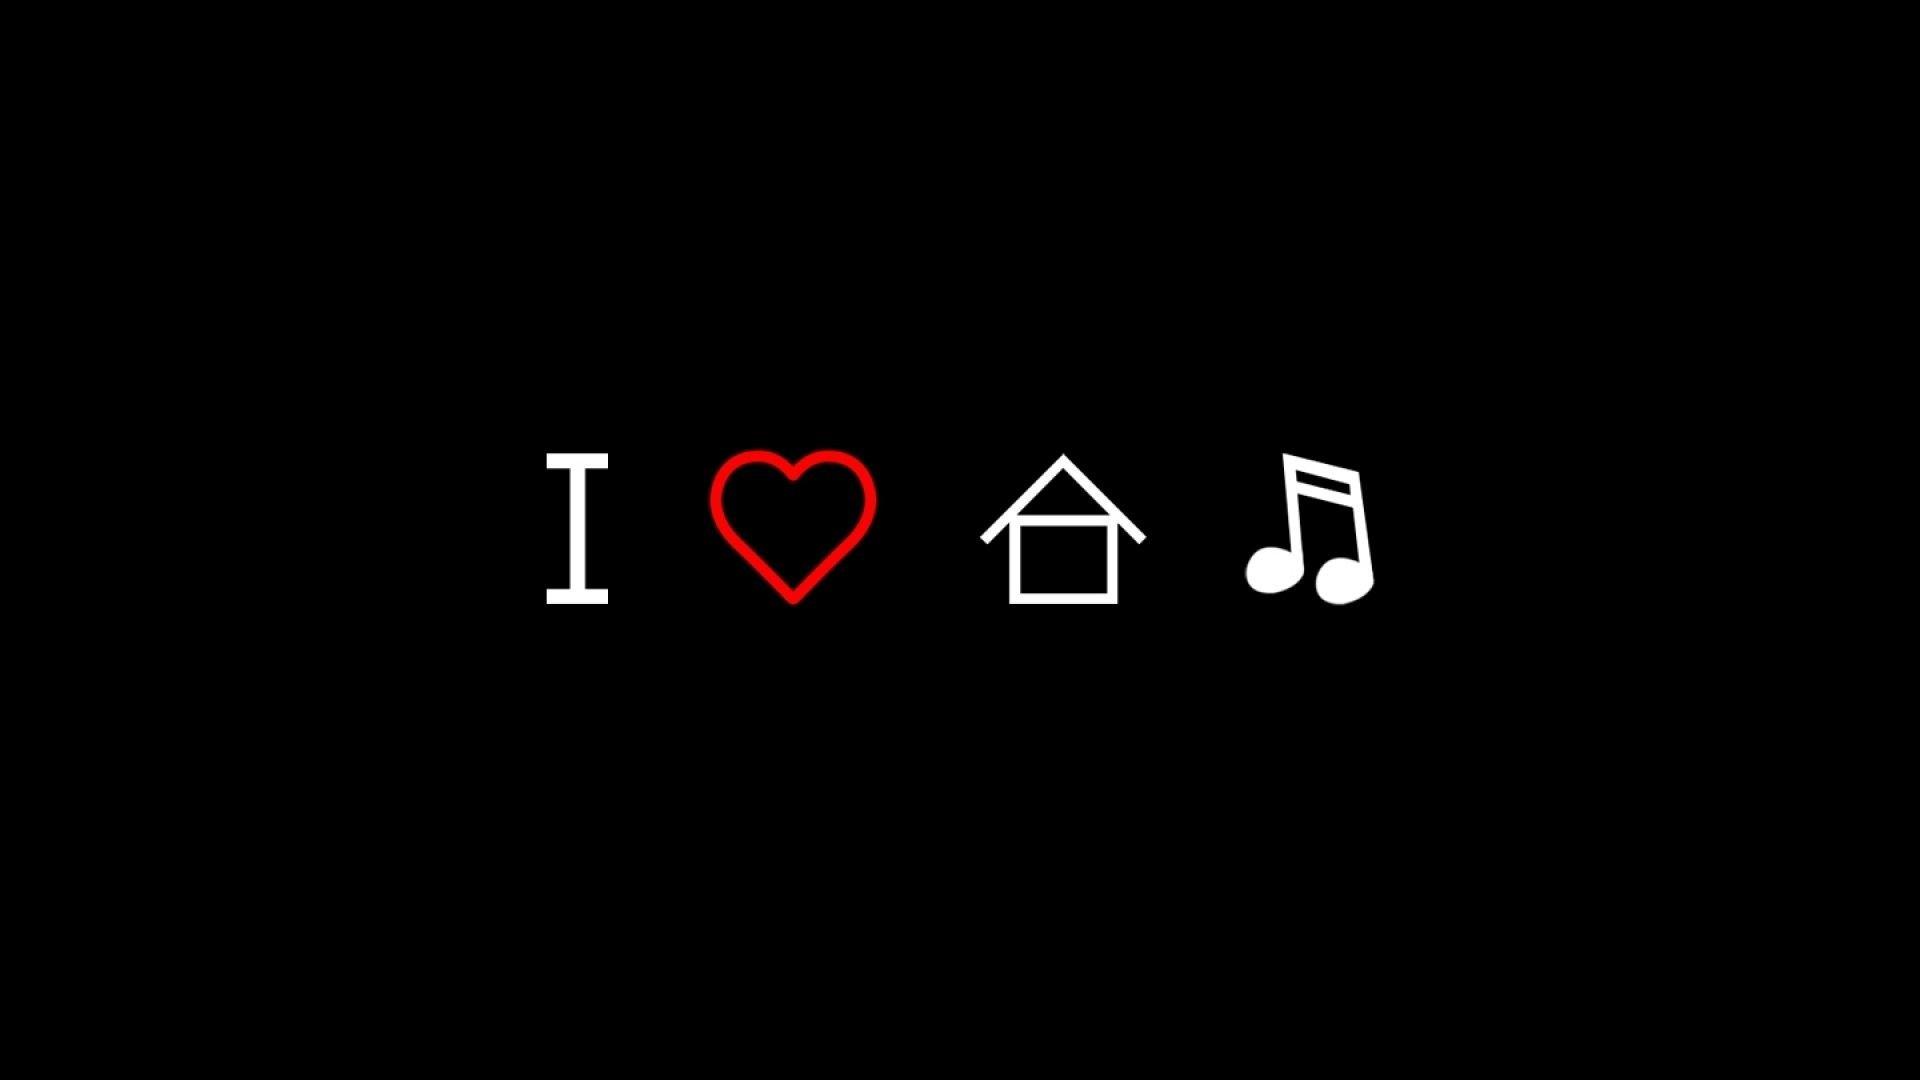 Love Music HD desktop wallpaper High Definition Mobile